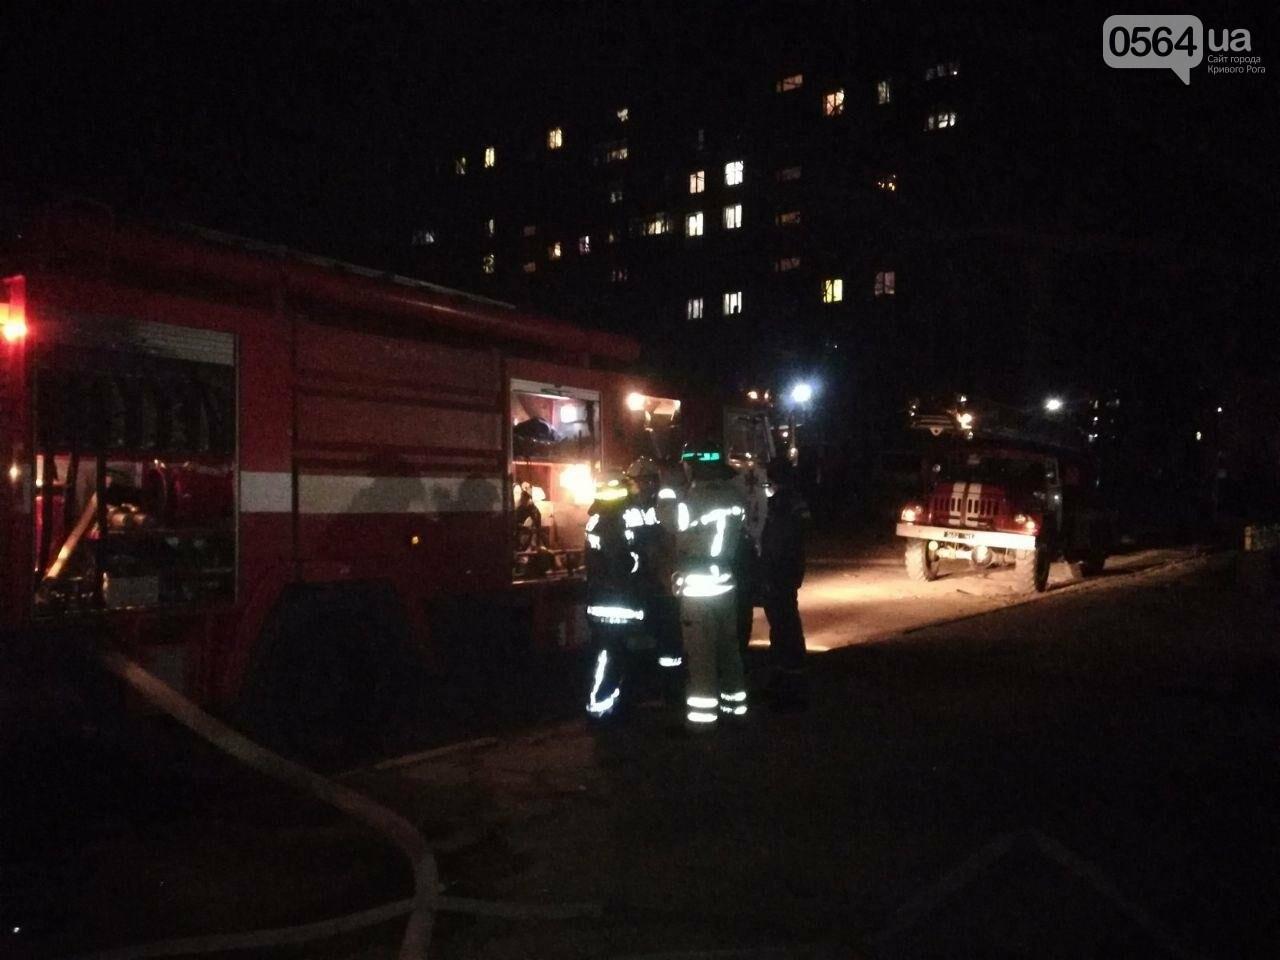 В Кривом Роге загорелась квартира на 6 этаже. Найдено тело мужчины, - ФОТО 18+, ВИДЕО, ОБНОВЛЕНО, фото-7